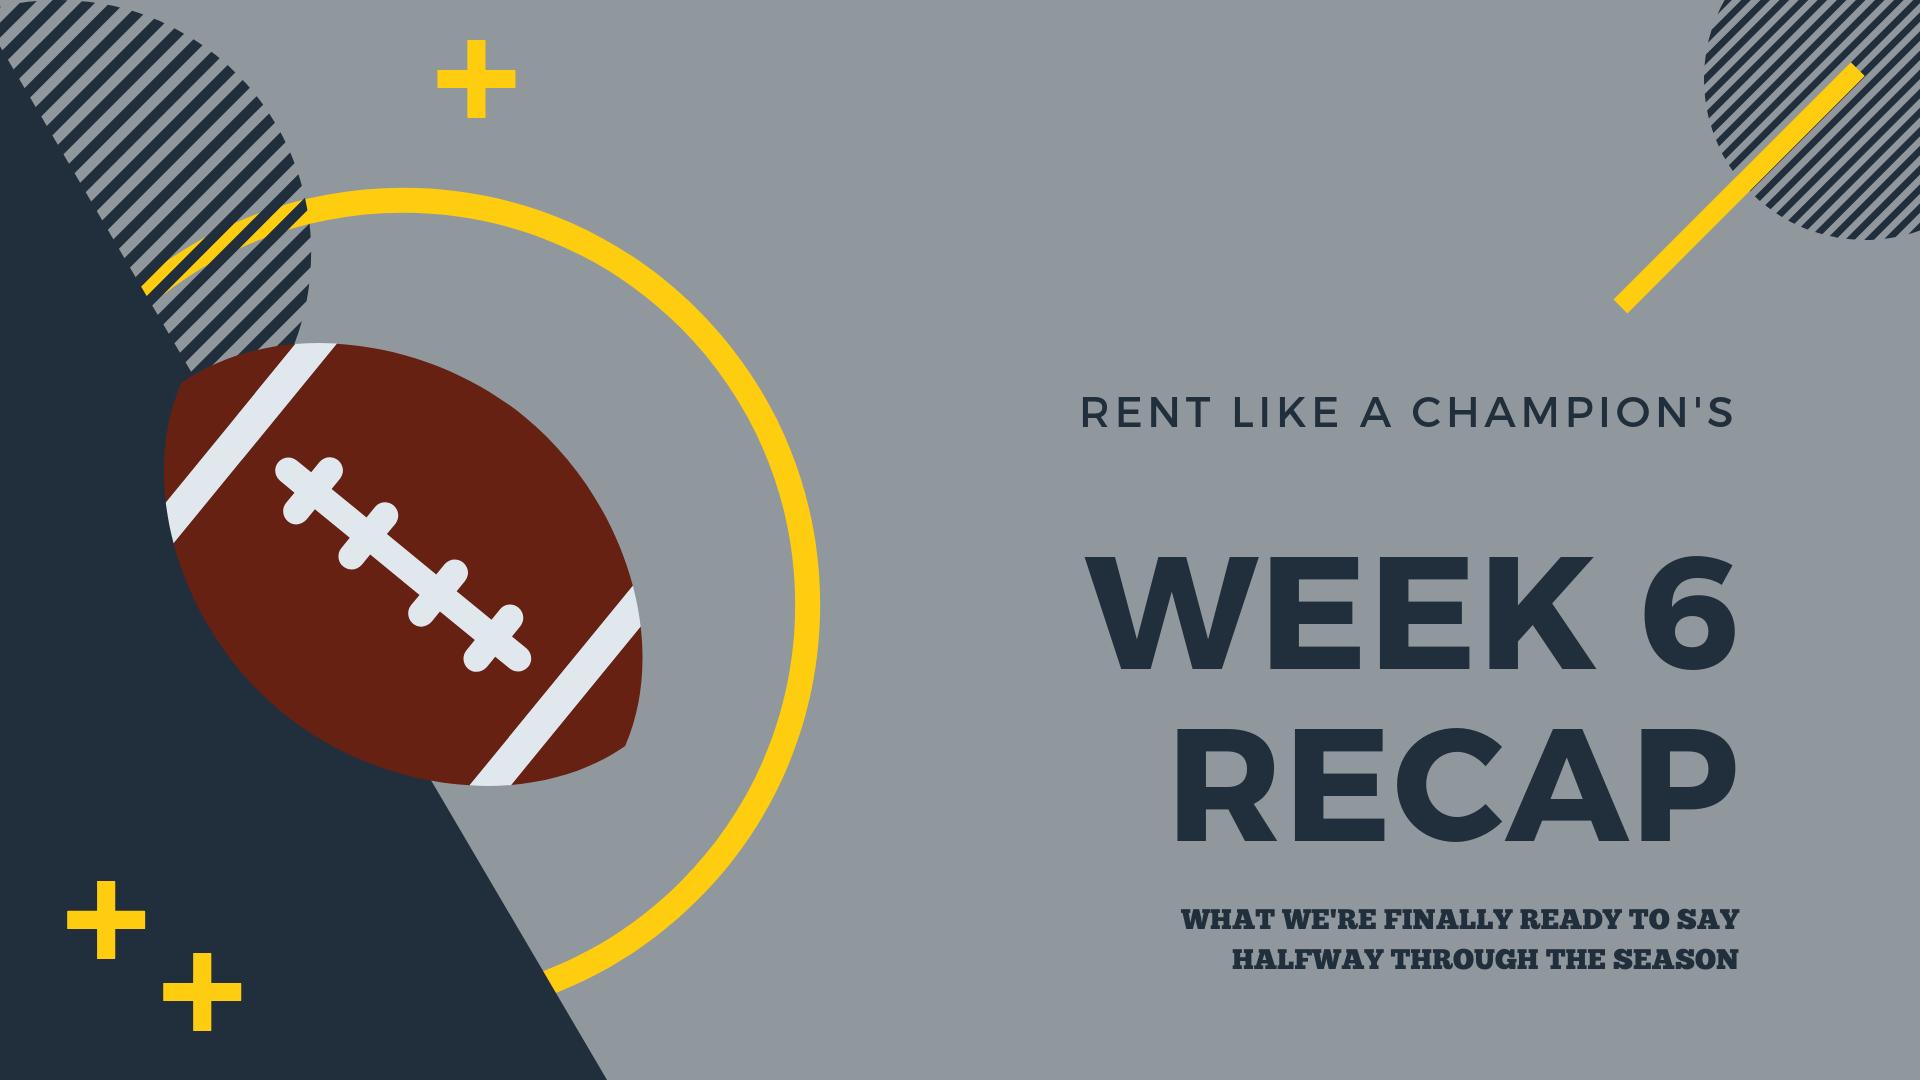 Week Recap Template (3)